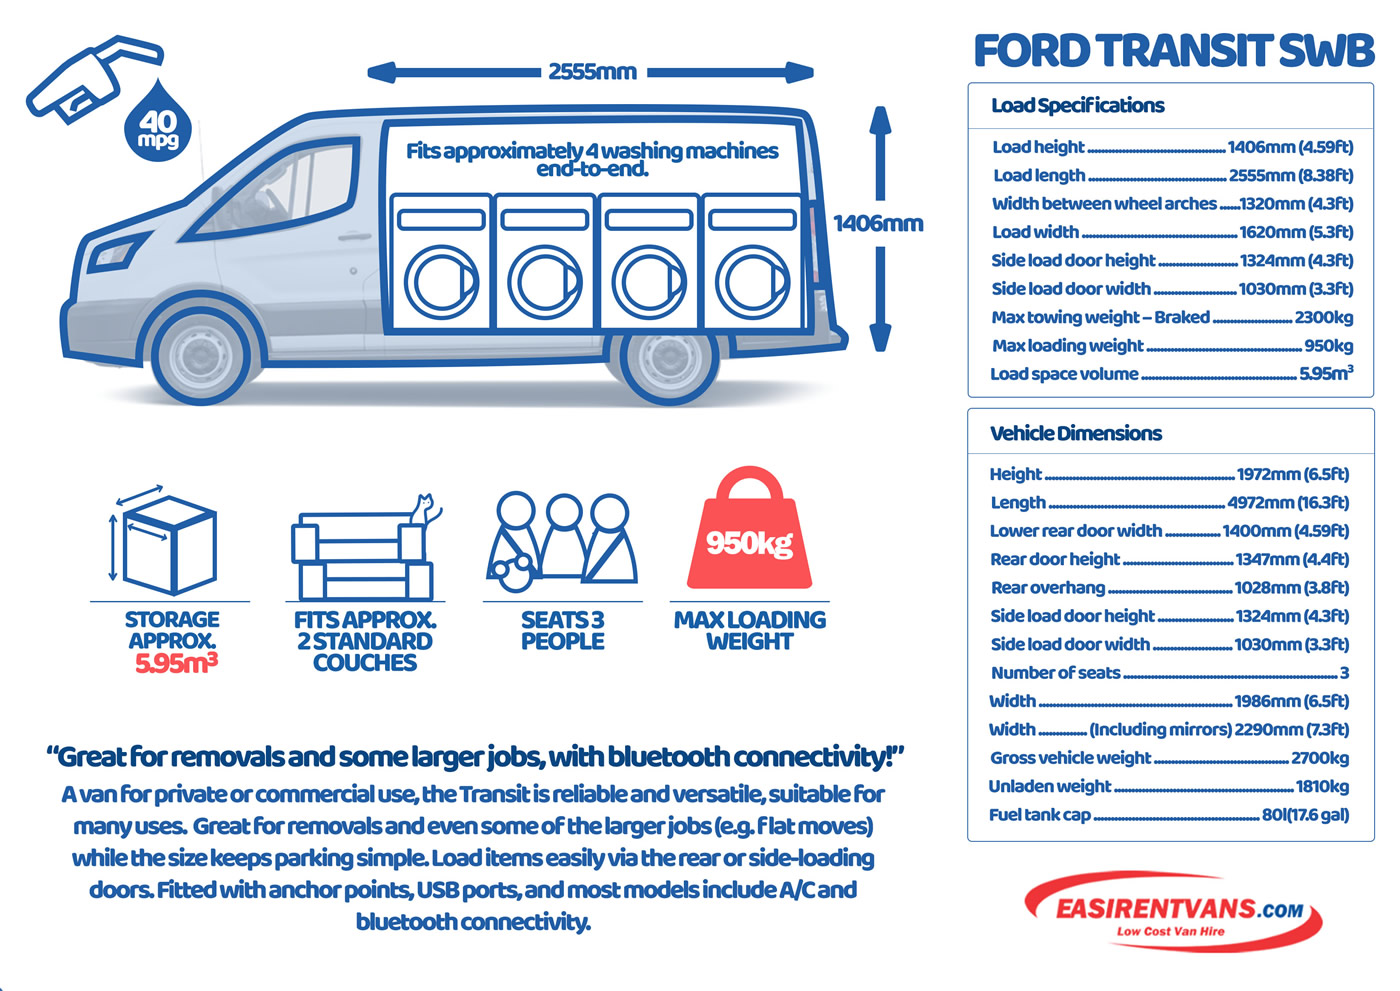 Ford Transit Specs